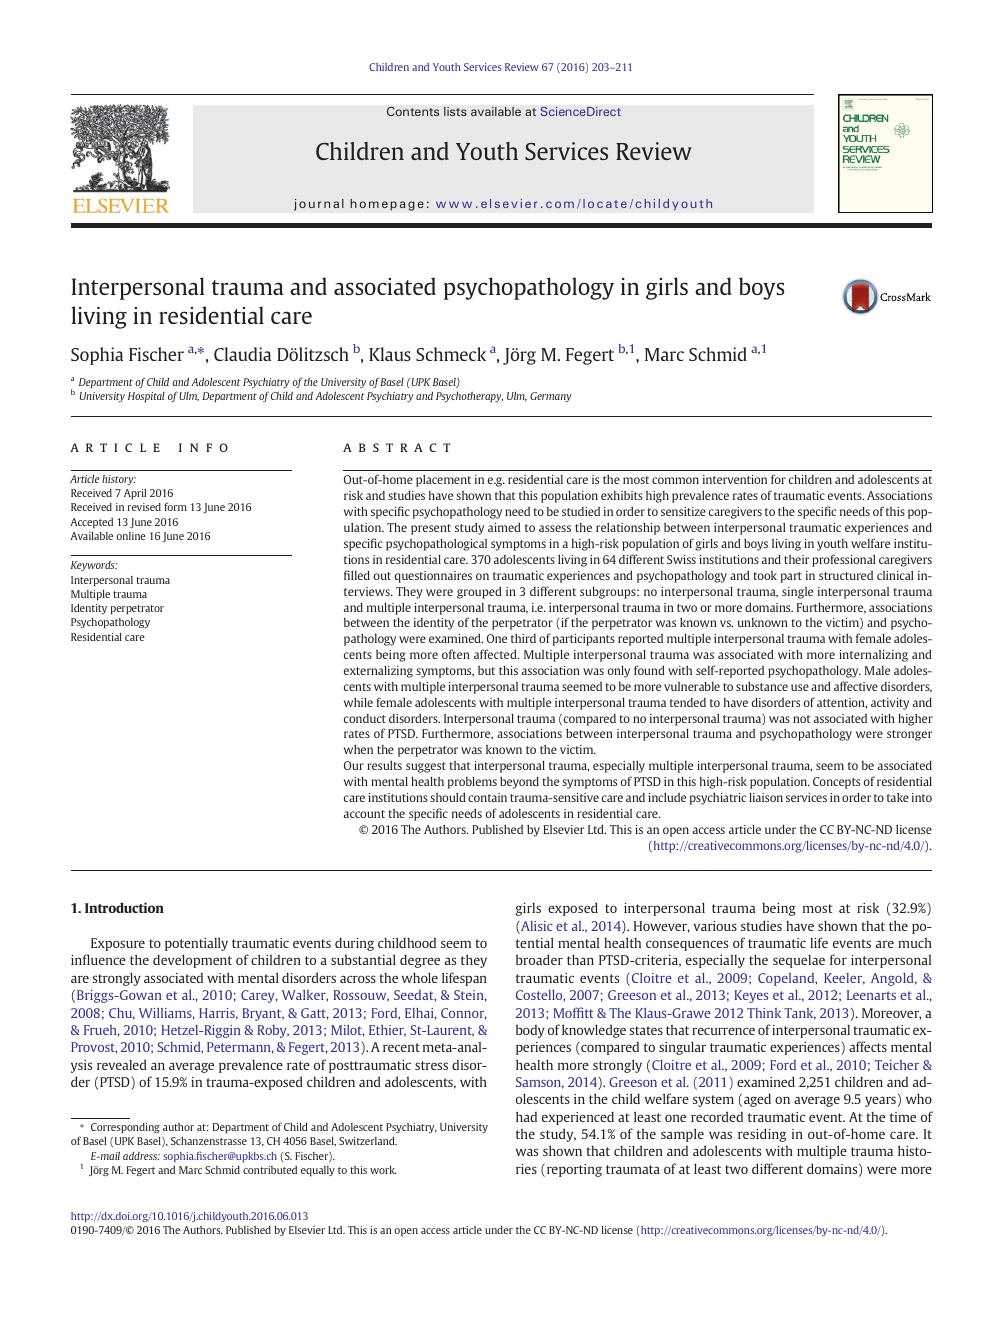 Interpersonal trauma and associated psychopathology in girls